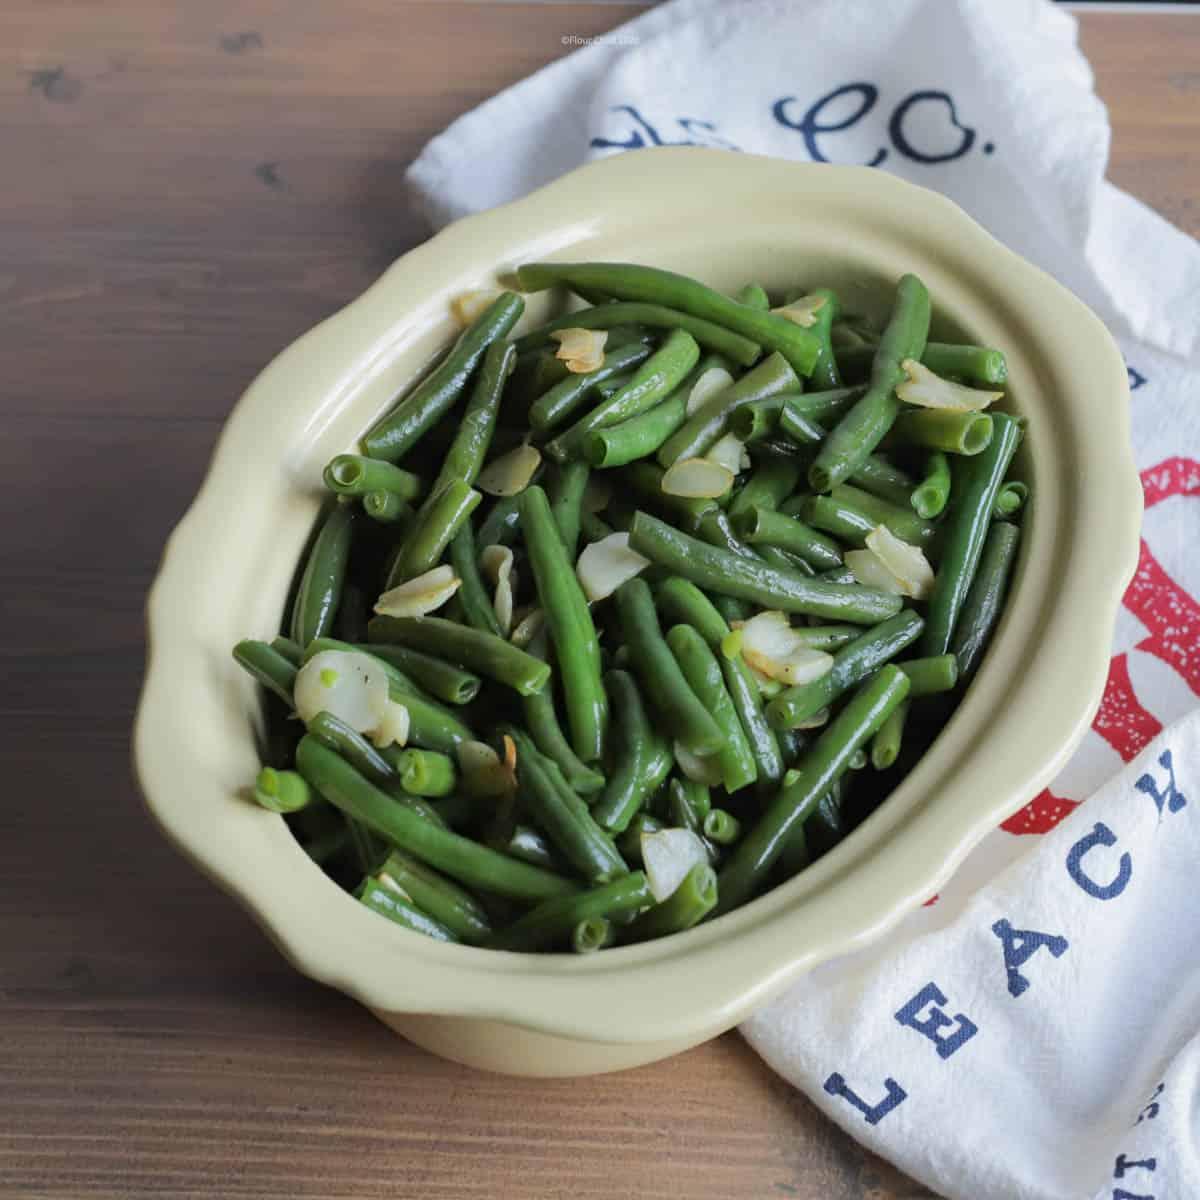 Fresh green beans with sautéed garlic slices make a farm fresh side dish